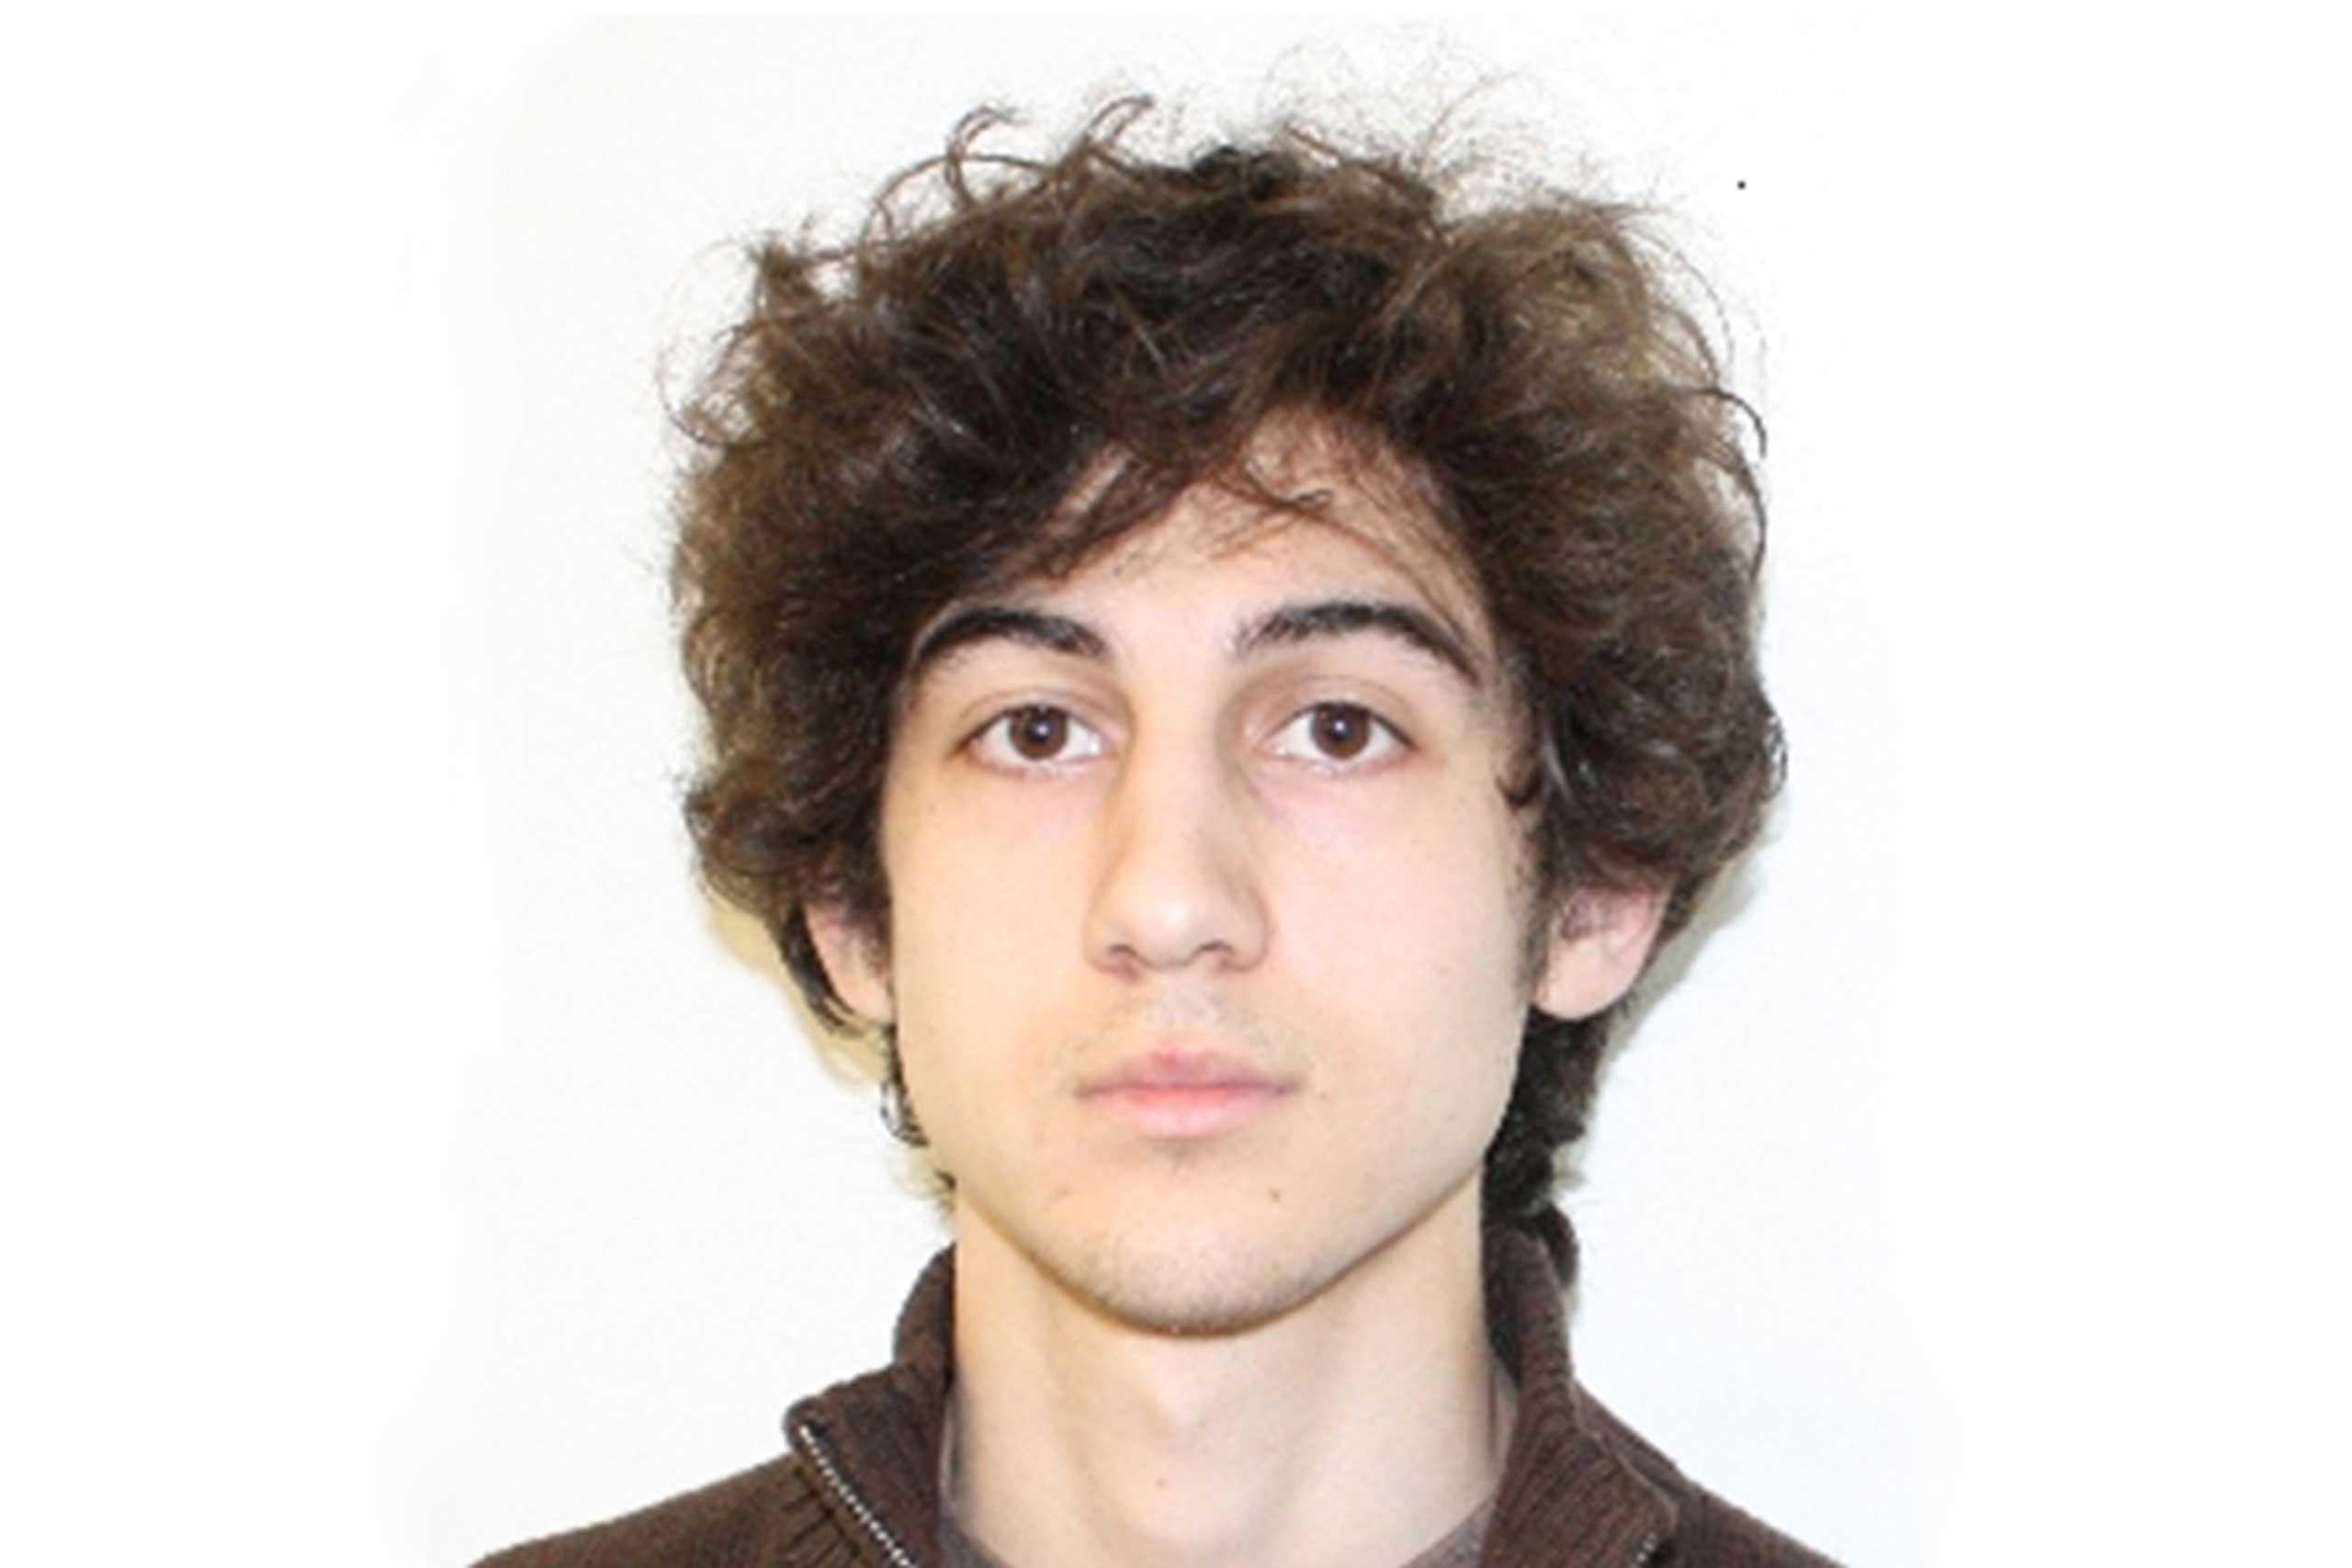 Dzhokhar Tsarnaev, a suspect in the Boston Marathon bombing, photo released on April 19, 2013.